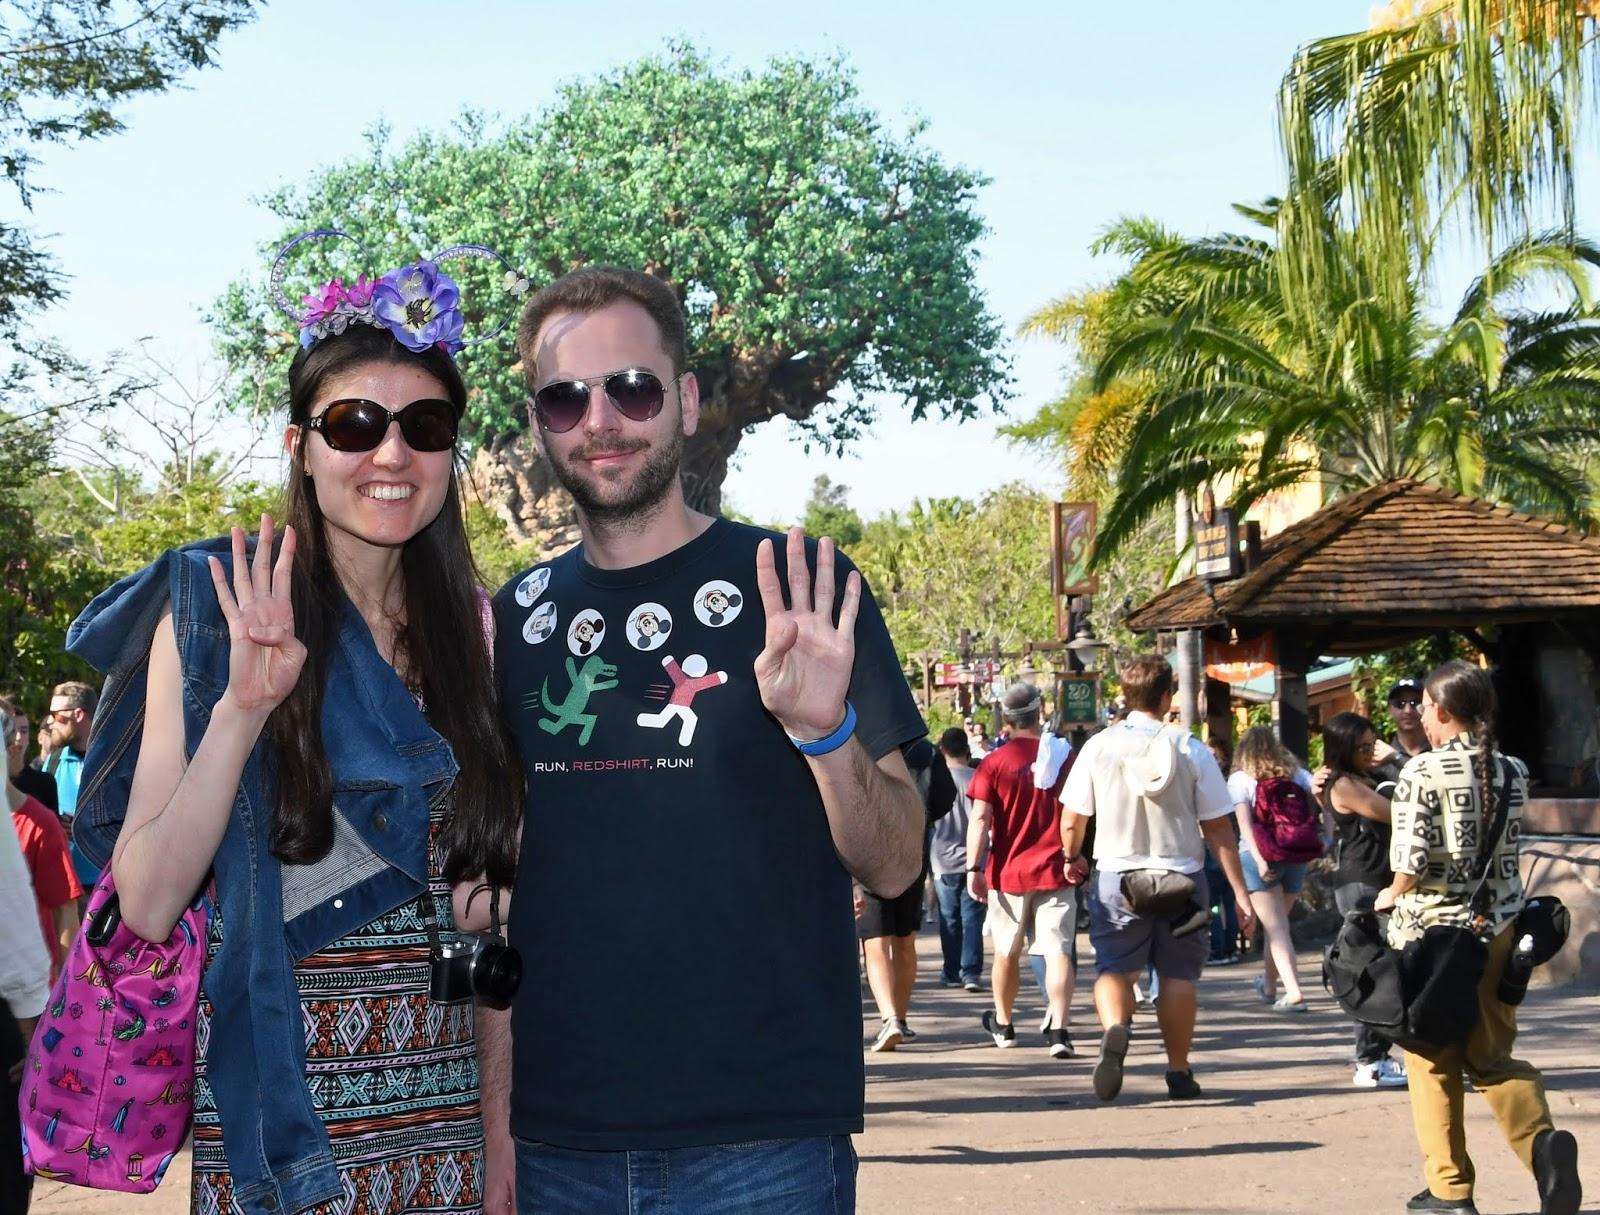 Our final park of the Walt Disney World 4 park challenge: Animal Kingdom